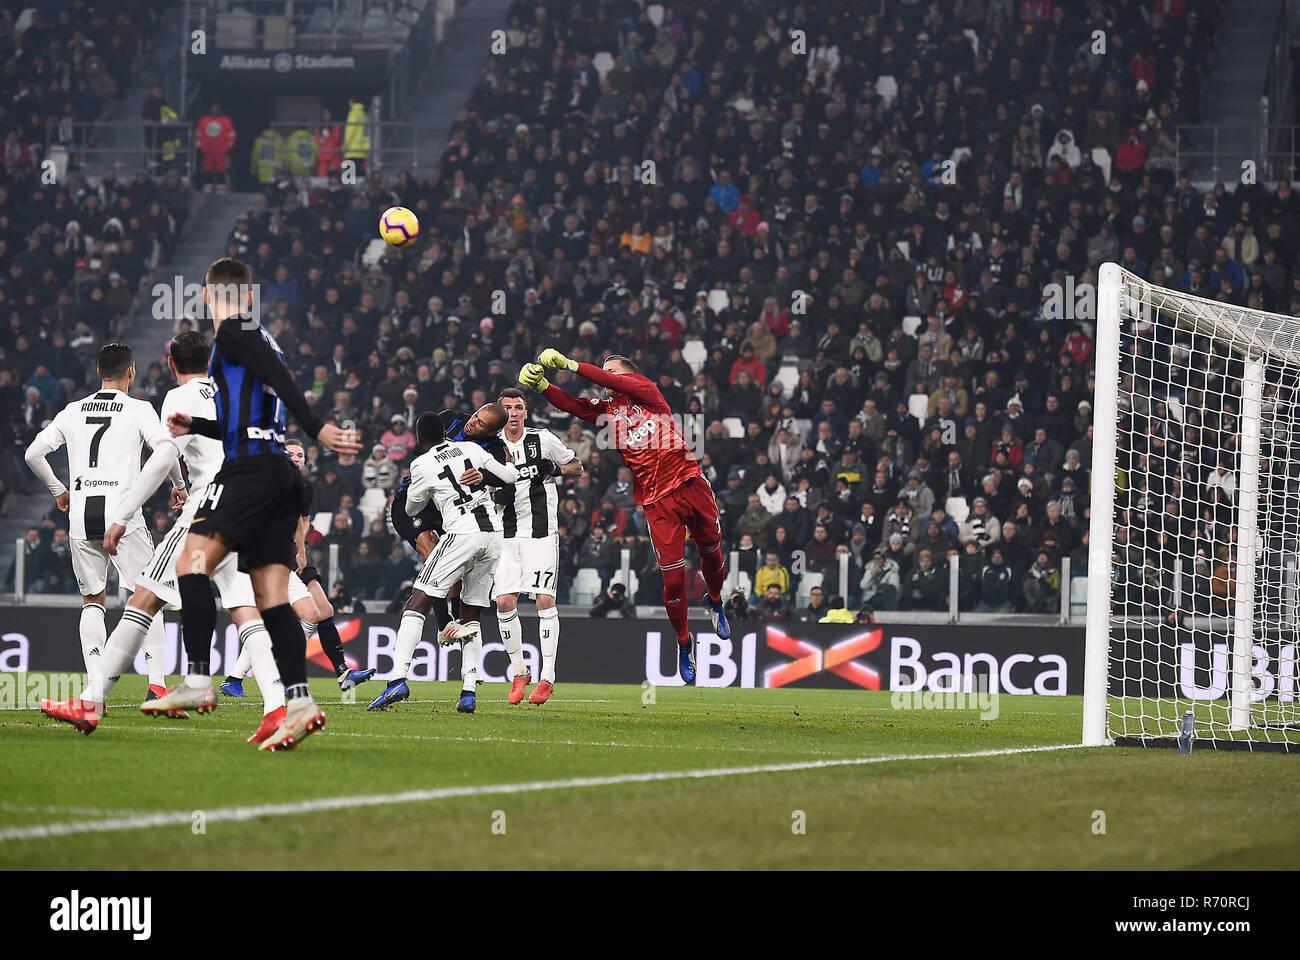 competitive price 3d60d 0148f Turin, Italy. 7th December 2018. Allianz Stadium. Nella foto ...